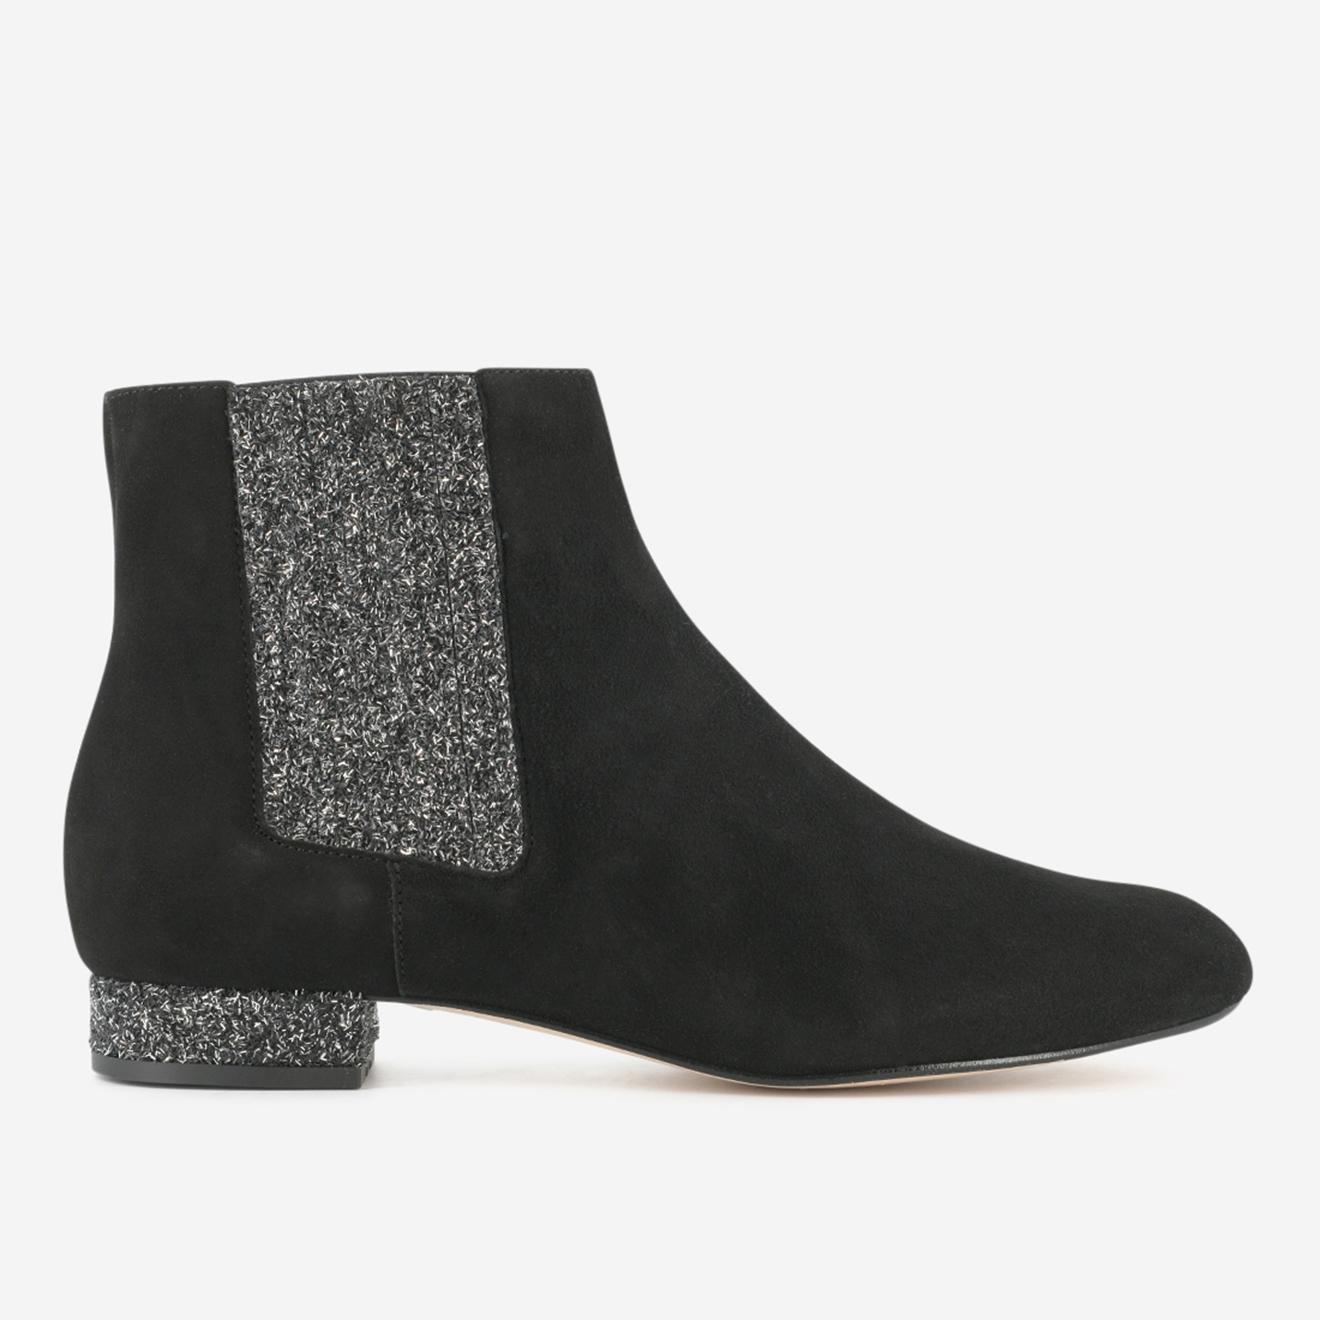 Chelsea Boots Efragon en Velours de Cuir noires - Mellow Yellow - Modalova